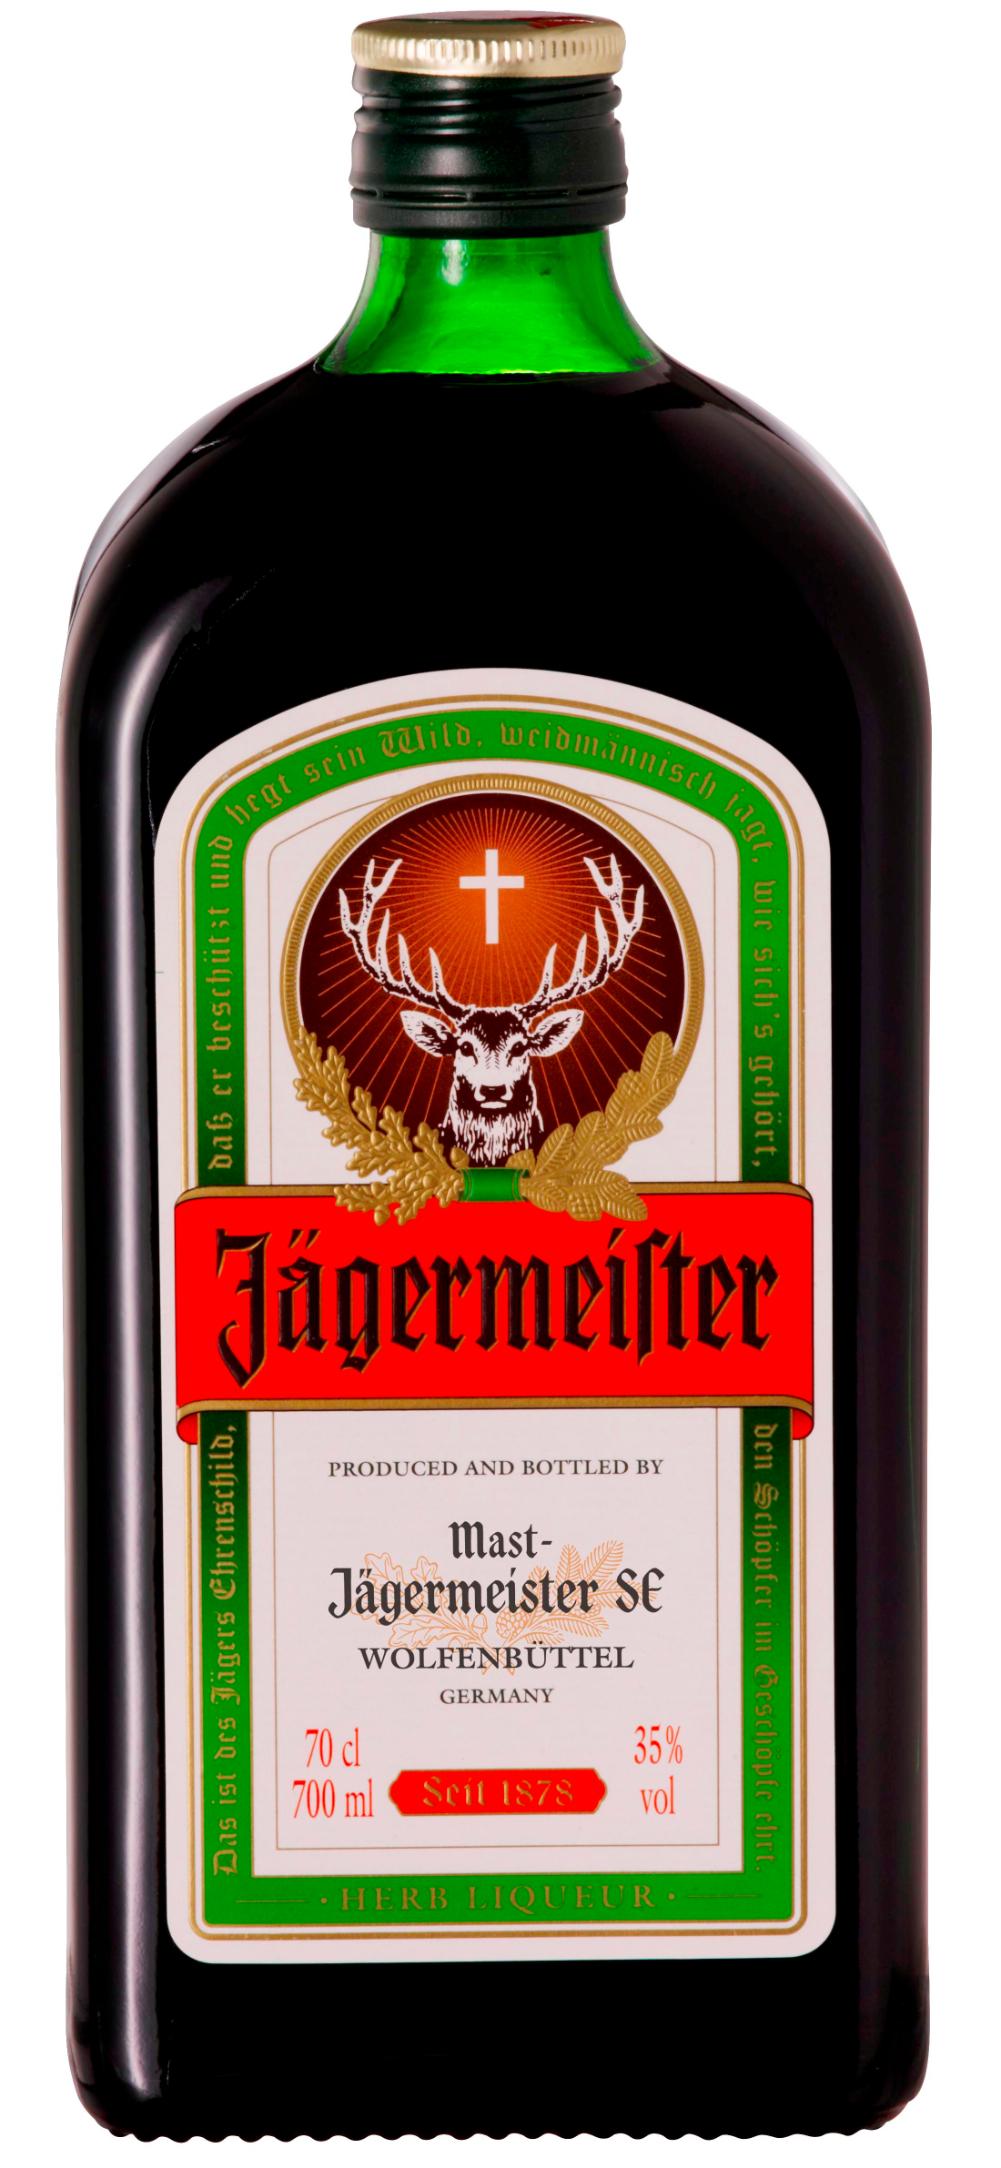 1001x2168 > Jägermeister Wallpapers